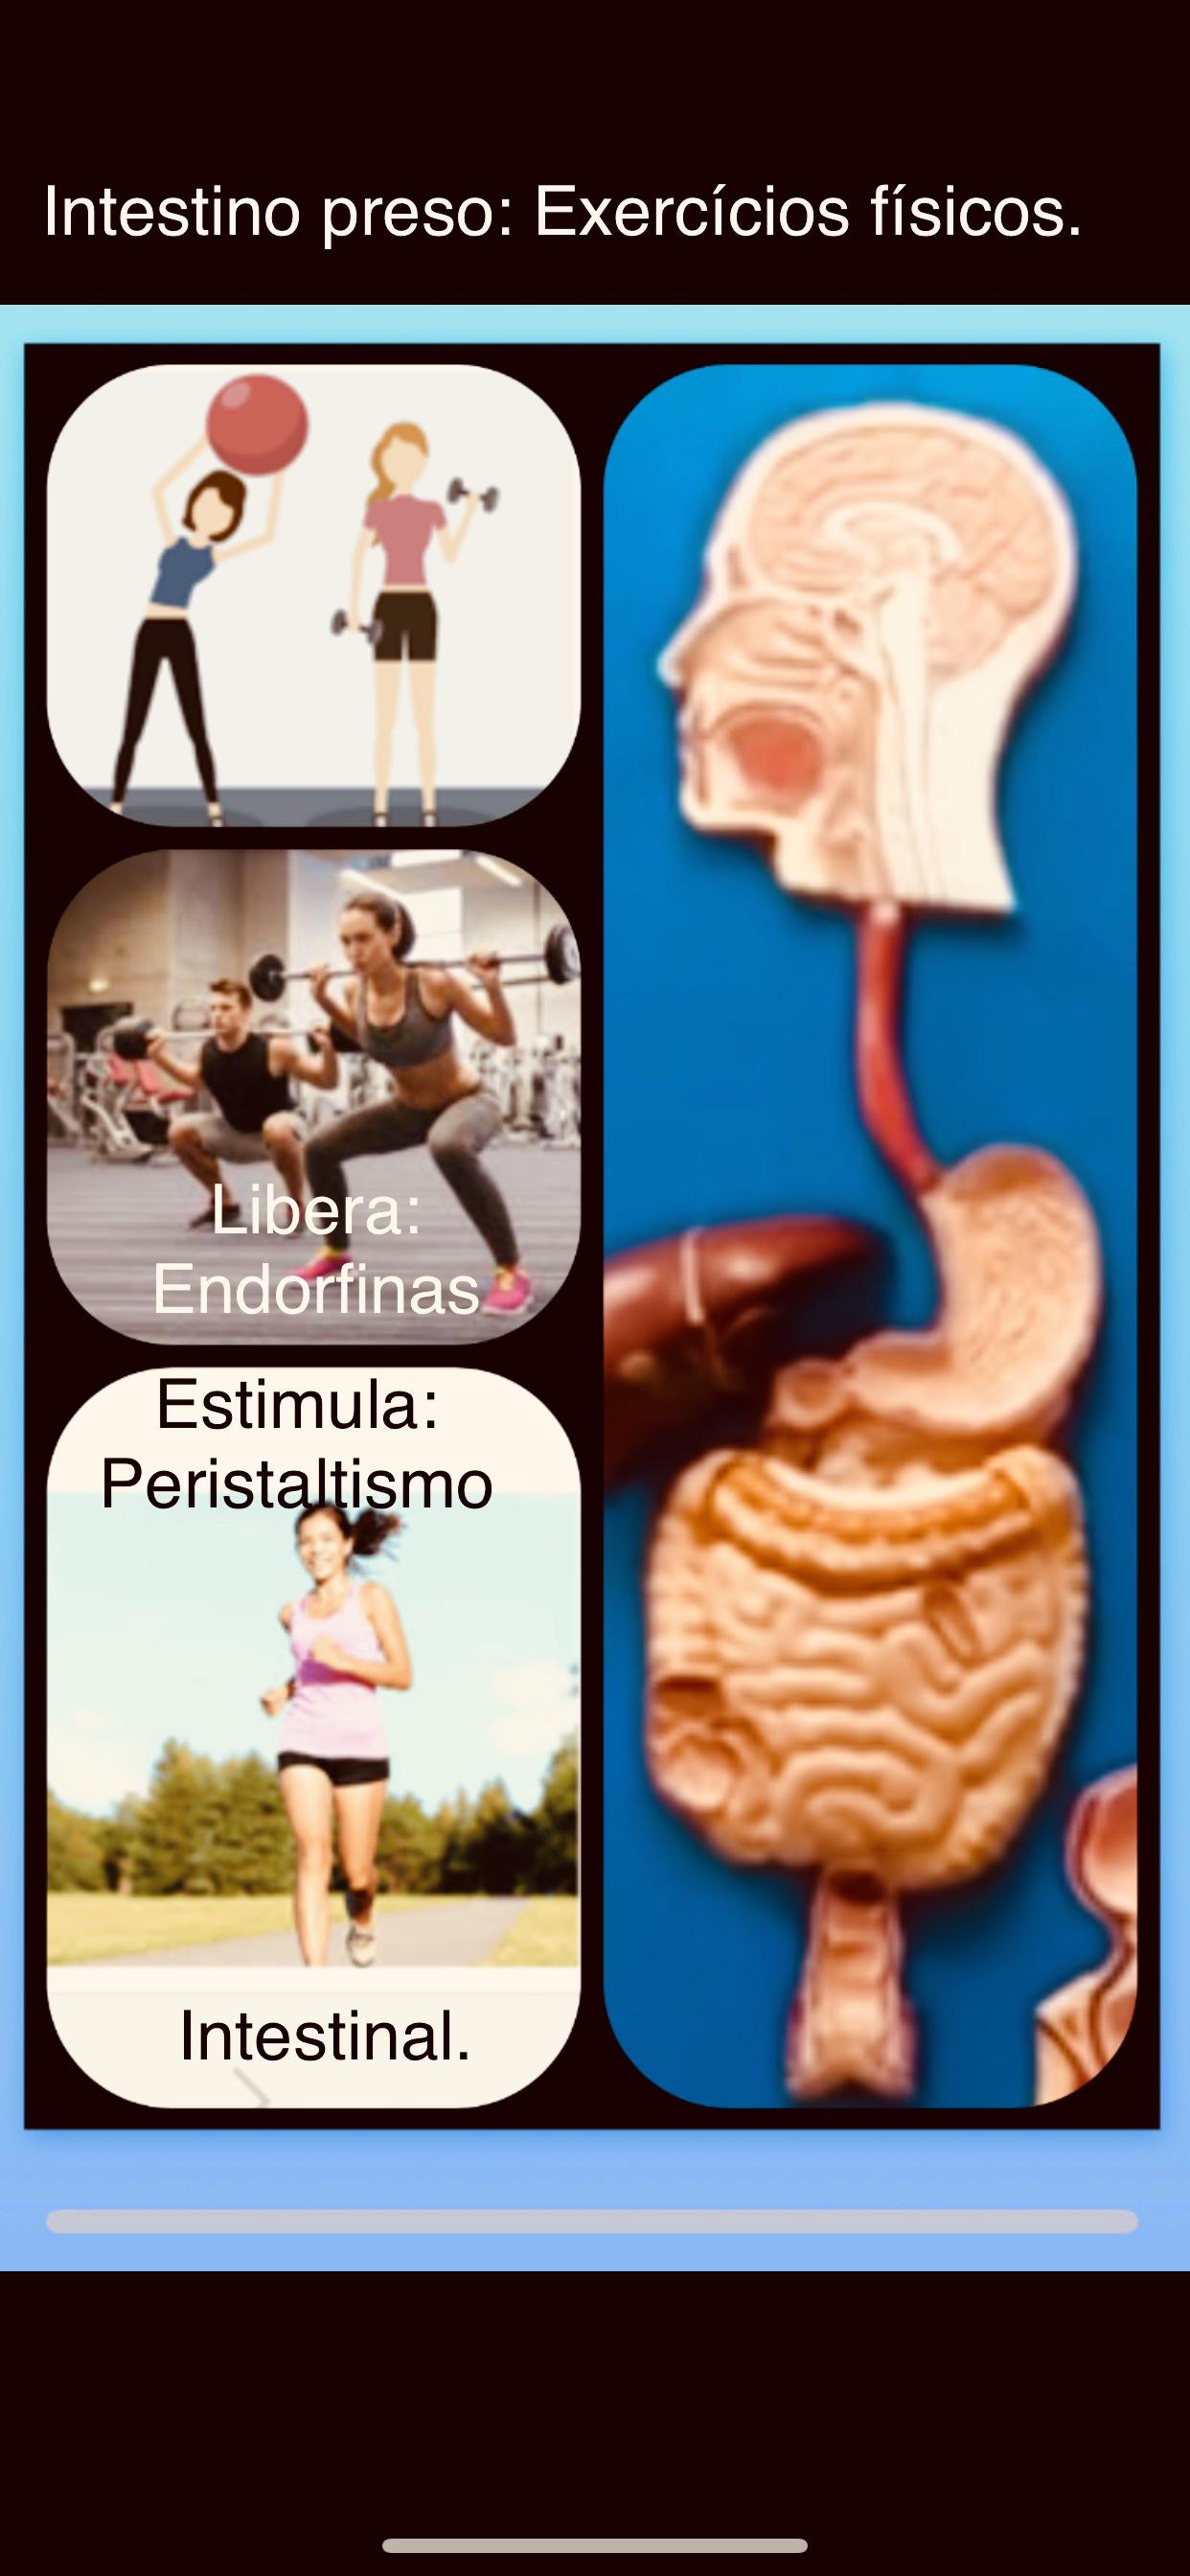 Exercícios físicos para intestino preso